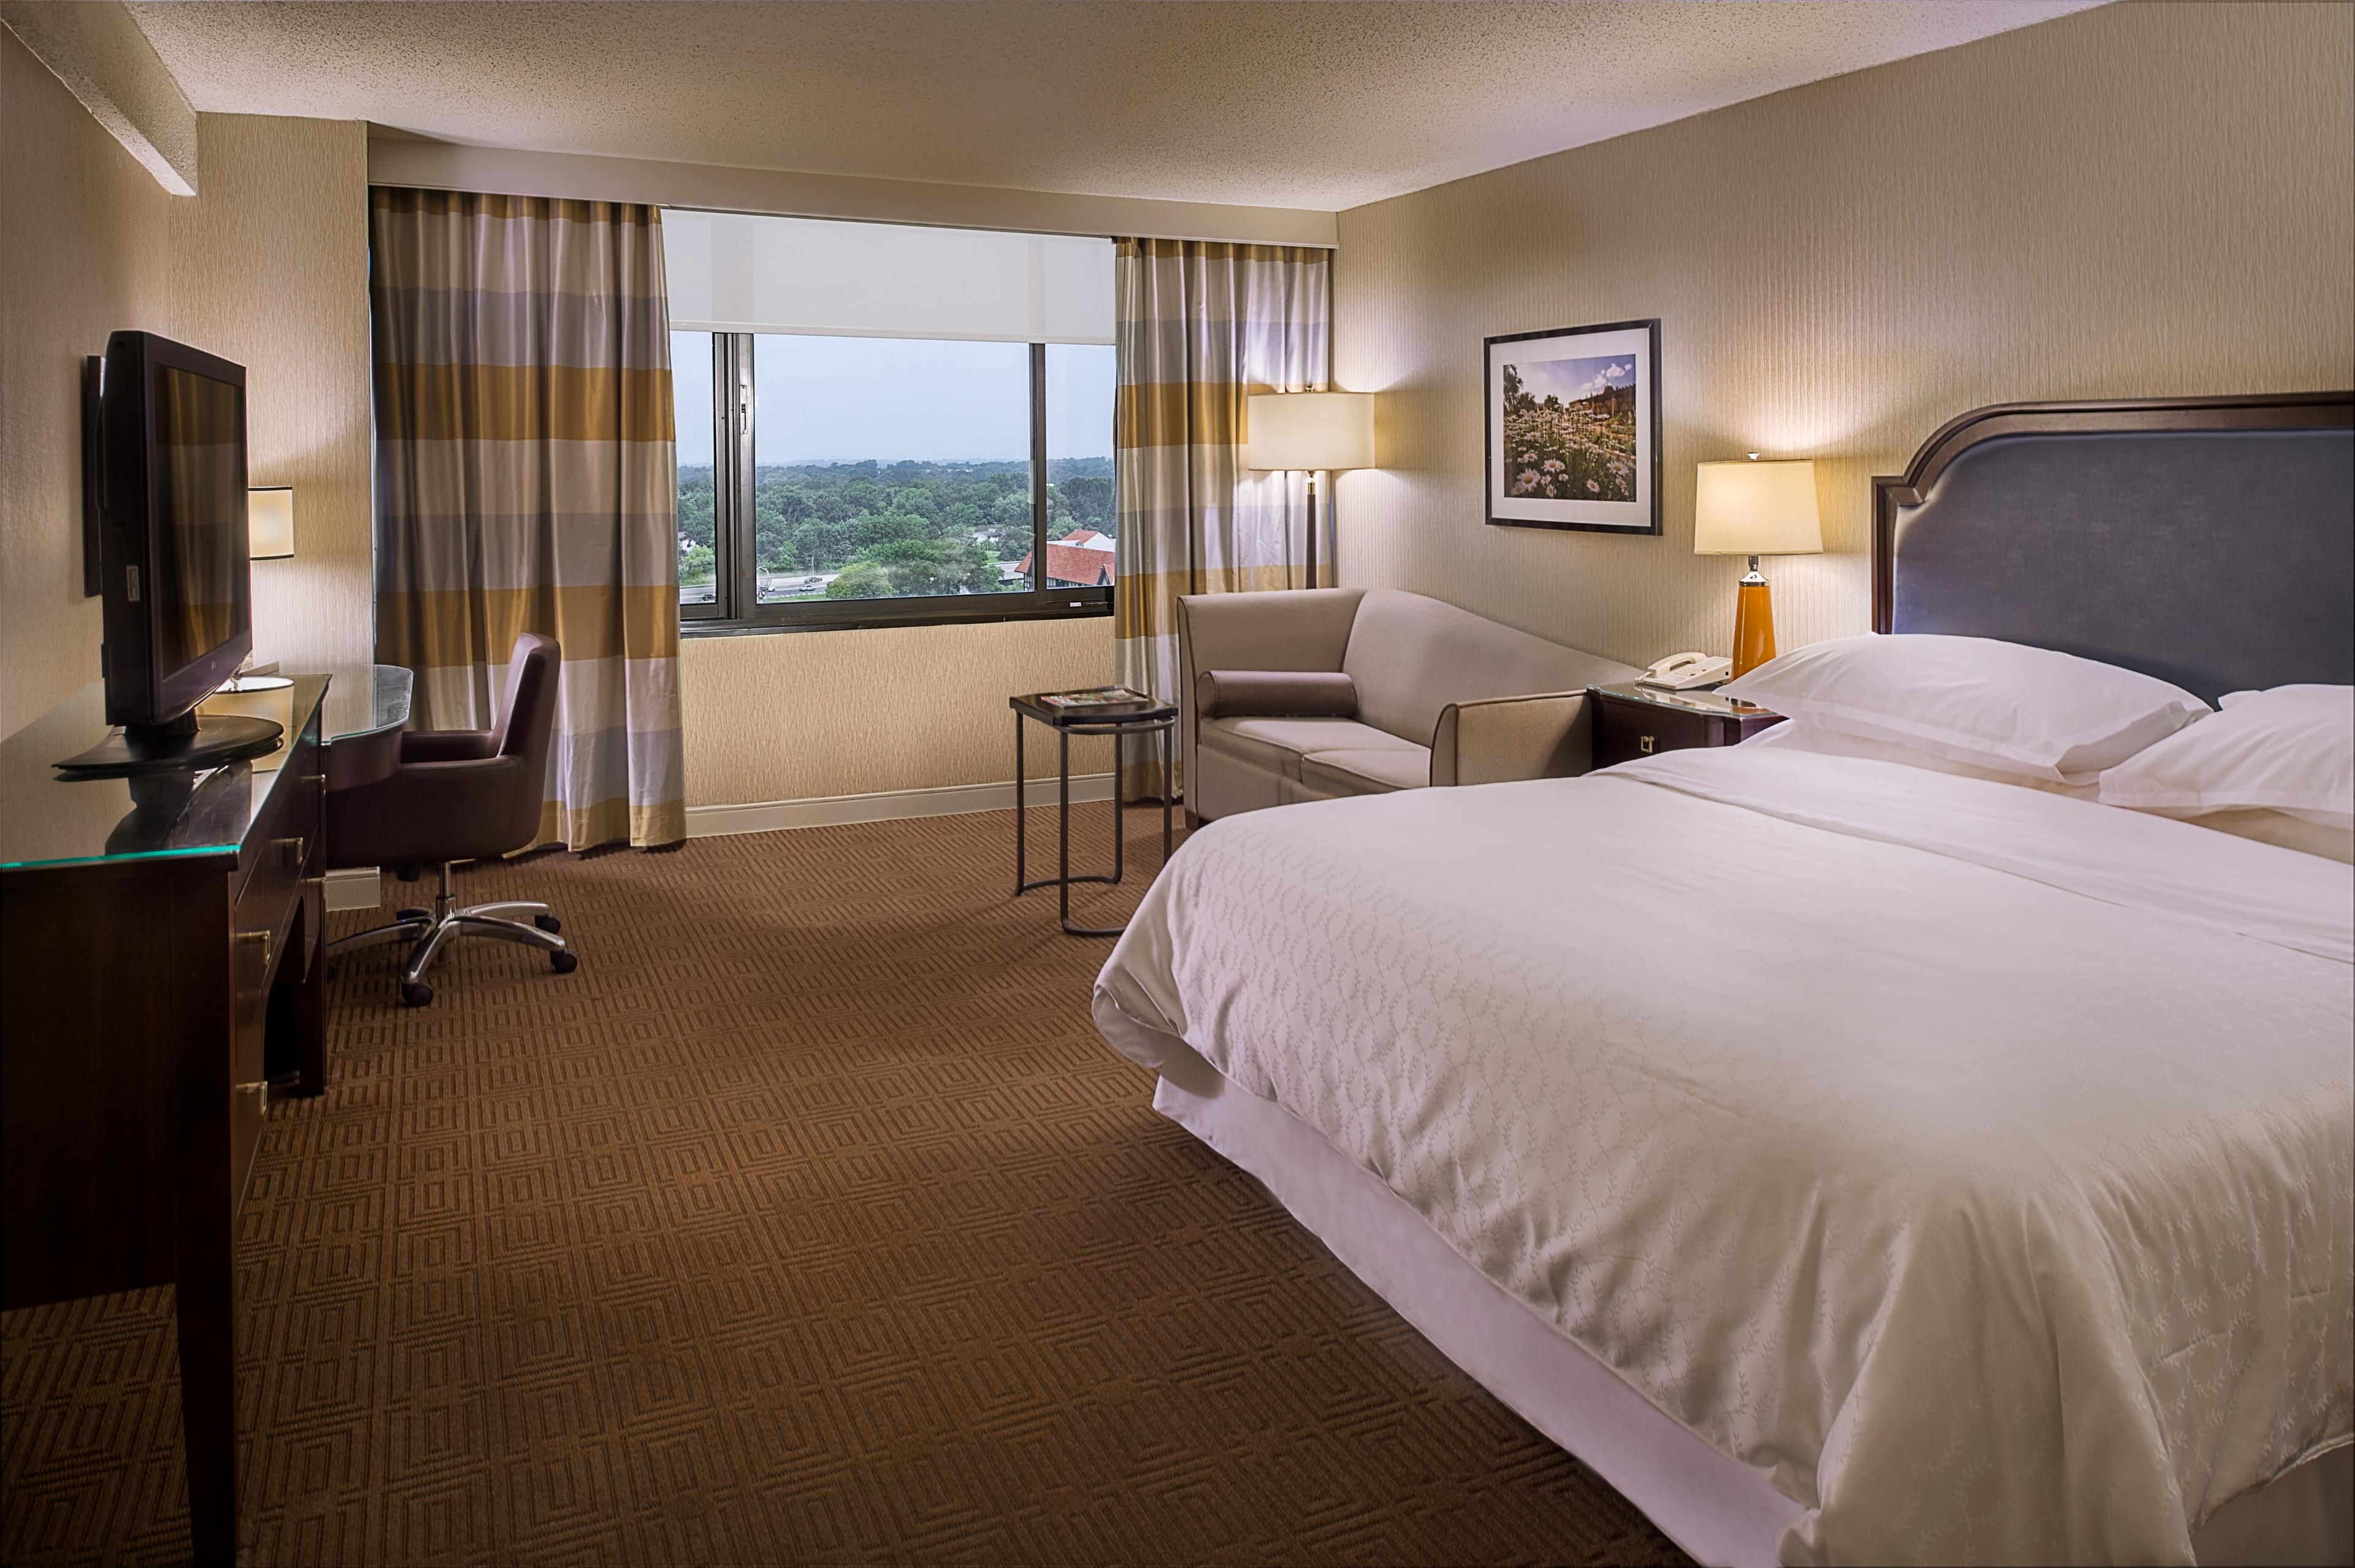 Sheraton Westport Plaza Hotel St. Louis image 27